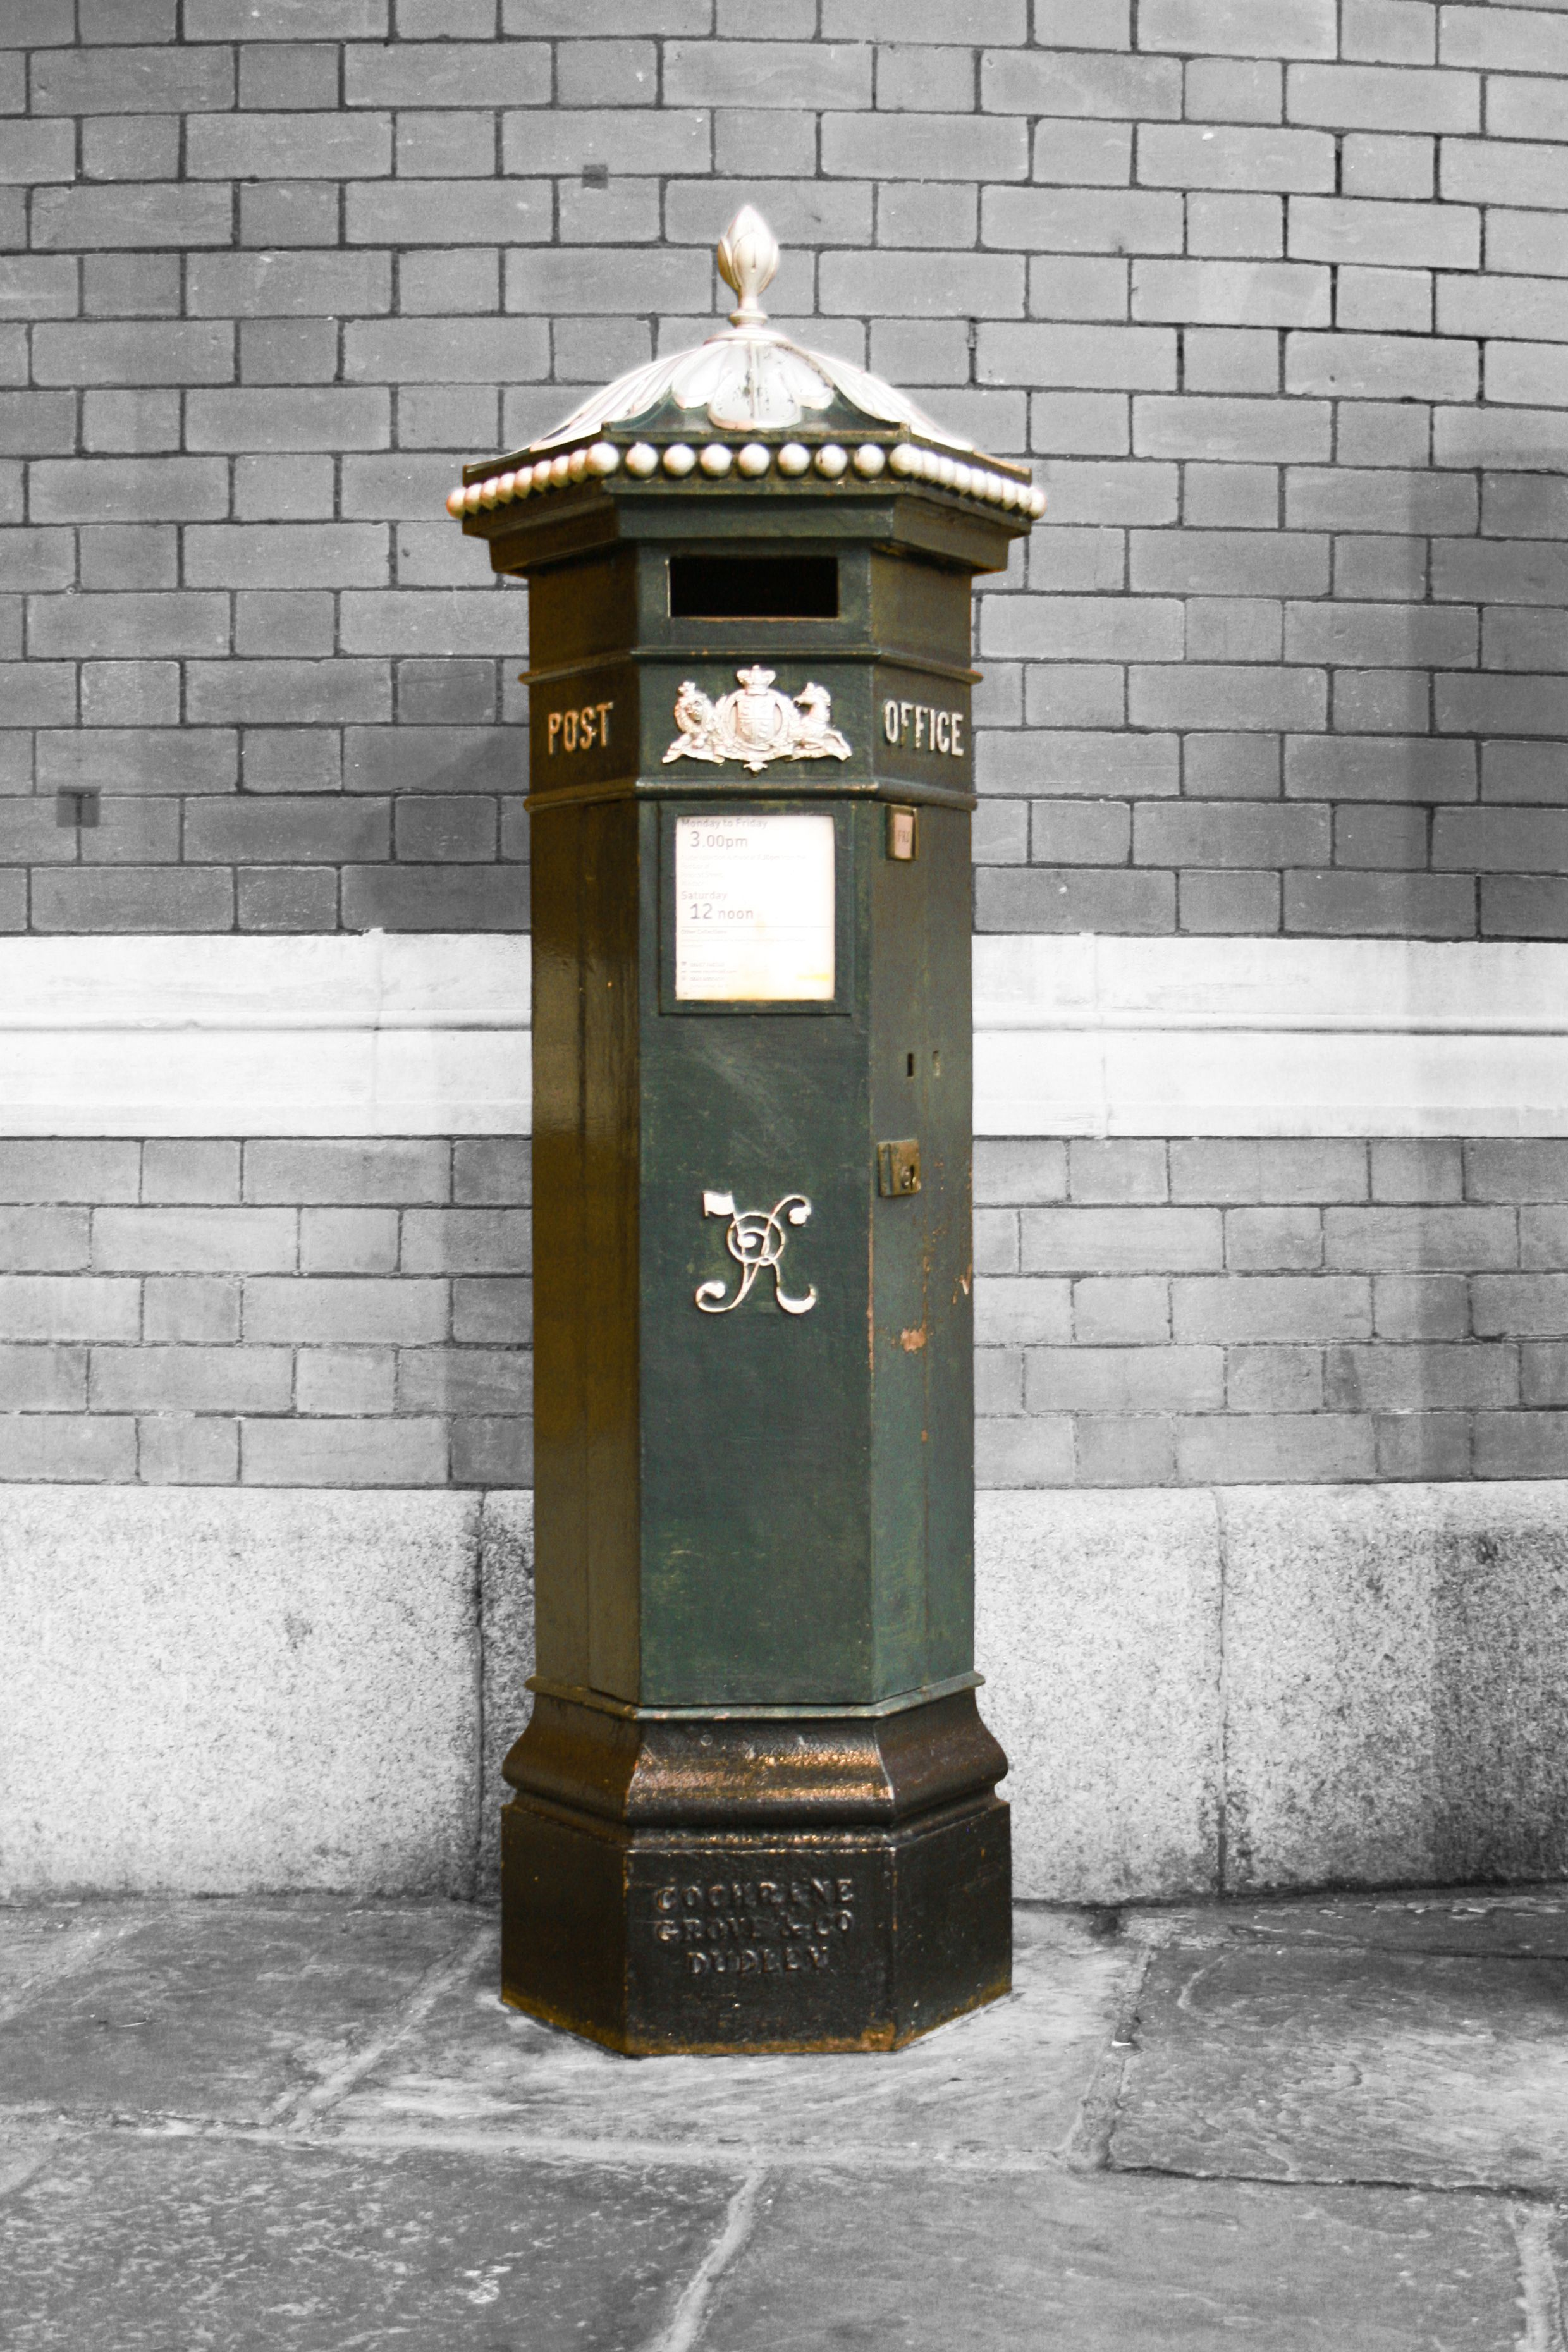 Victoria, Royal Windsor Arcade Old mailbox, Antique